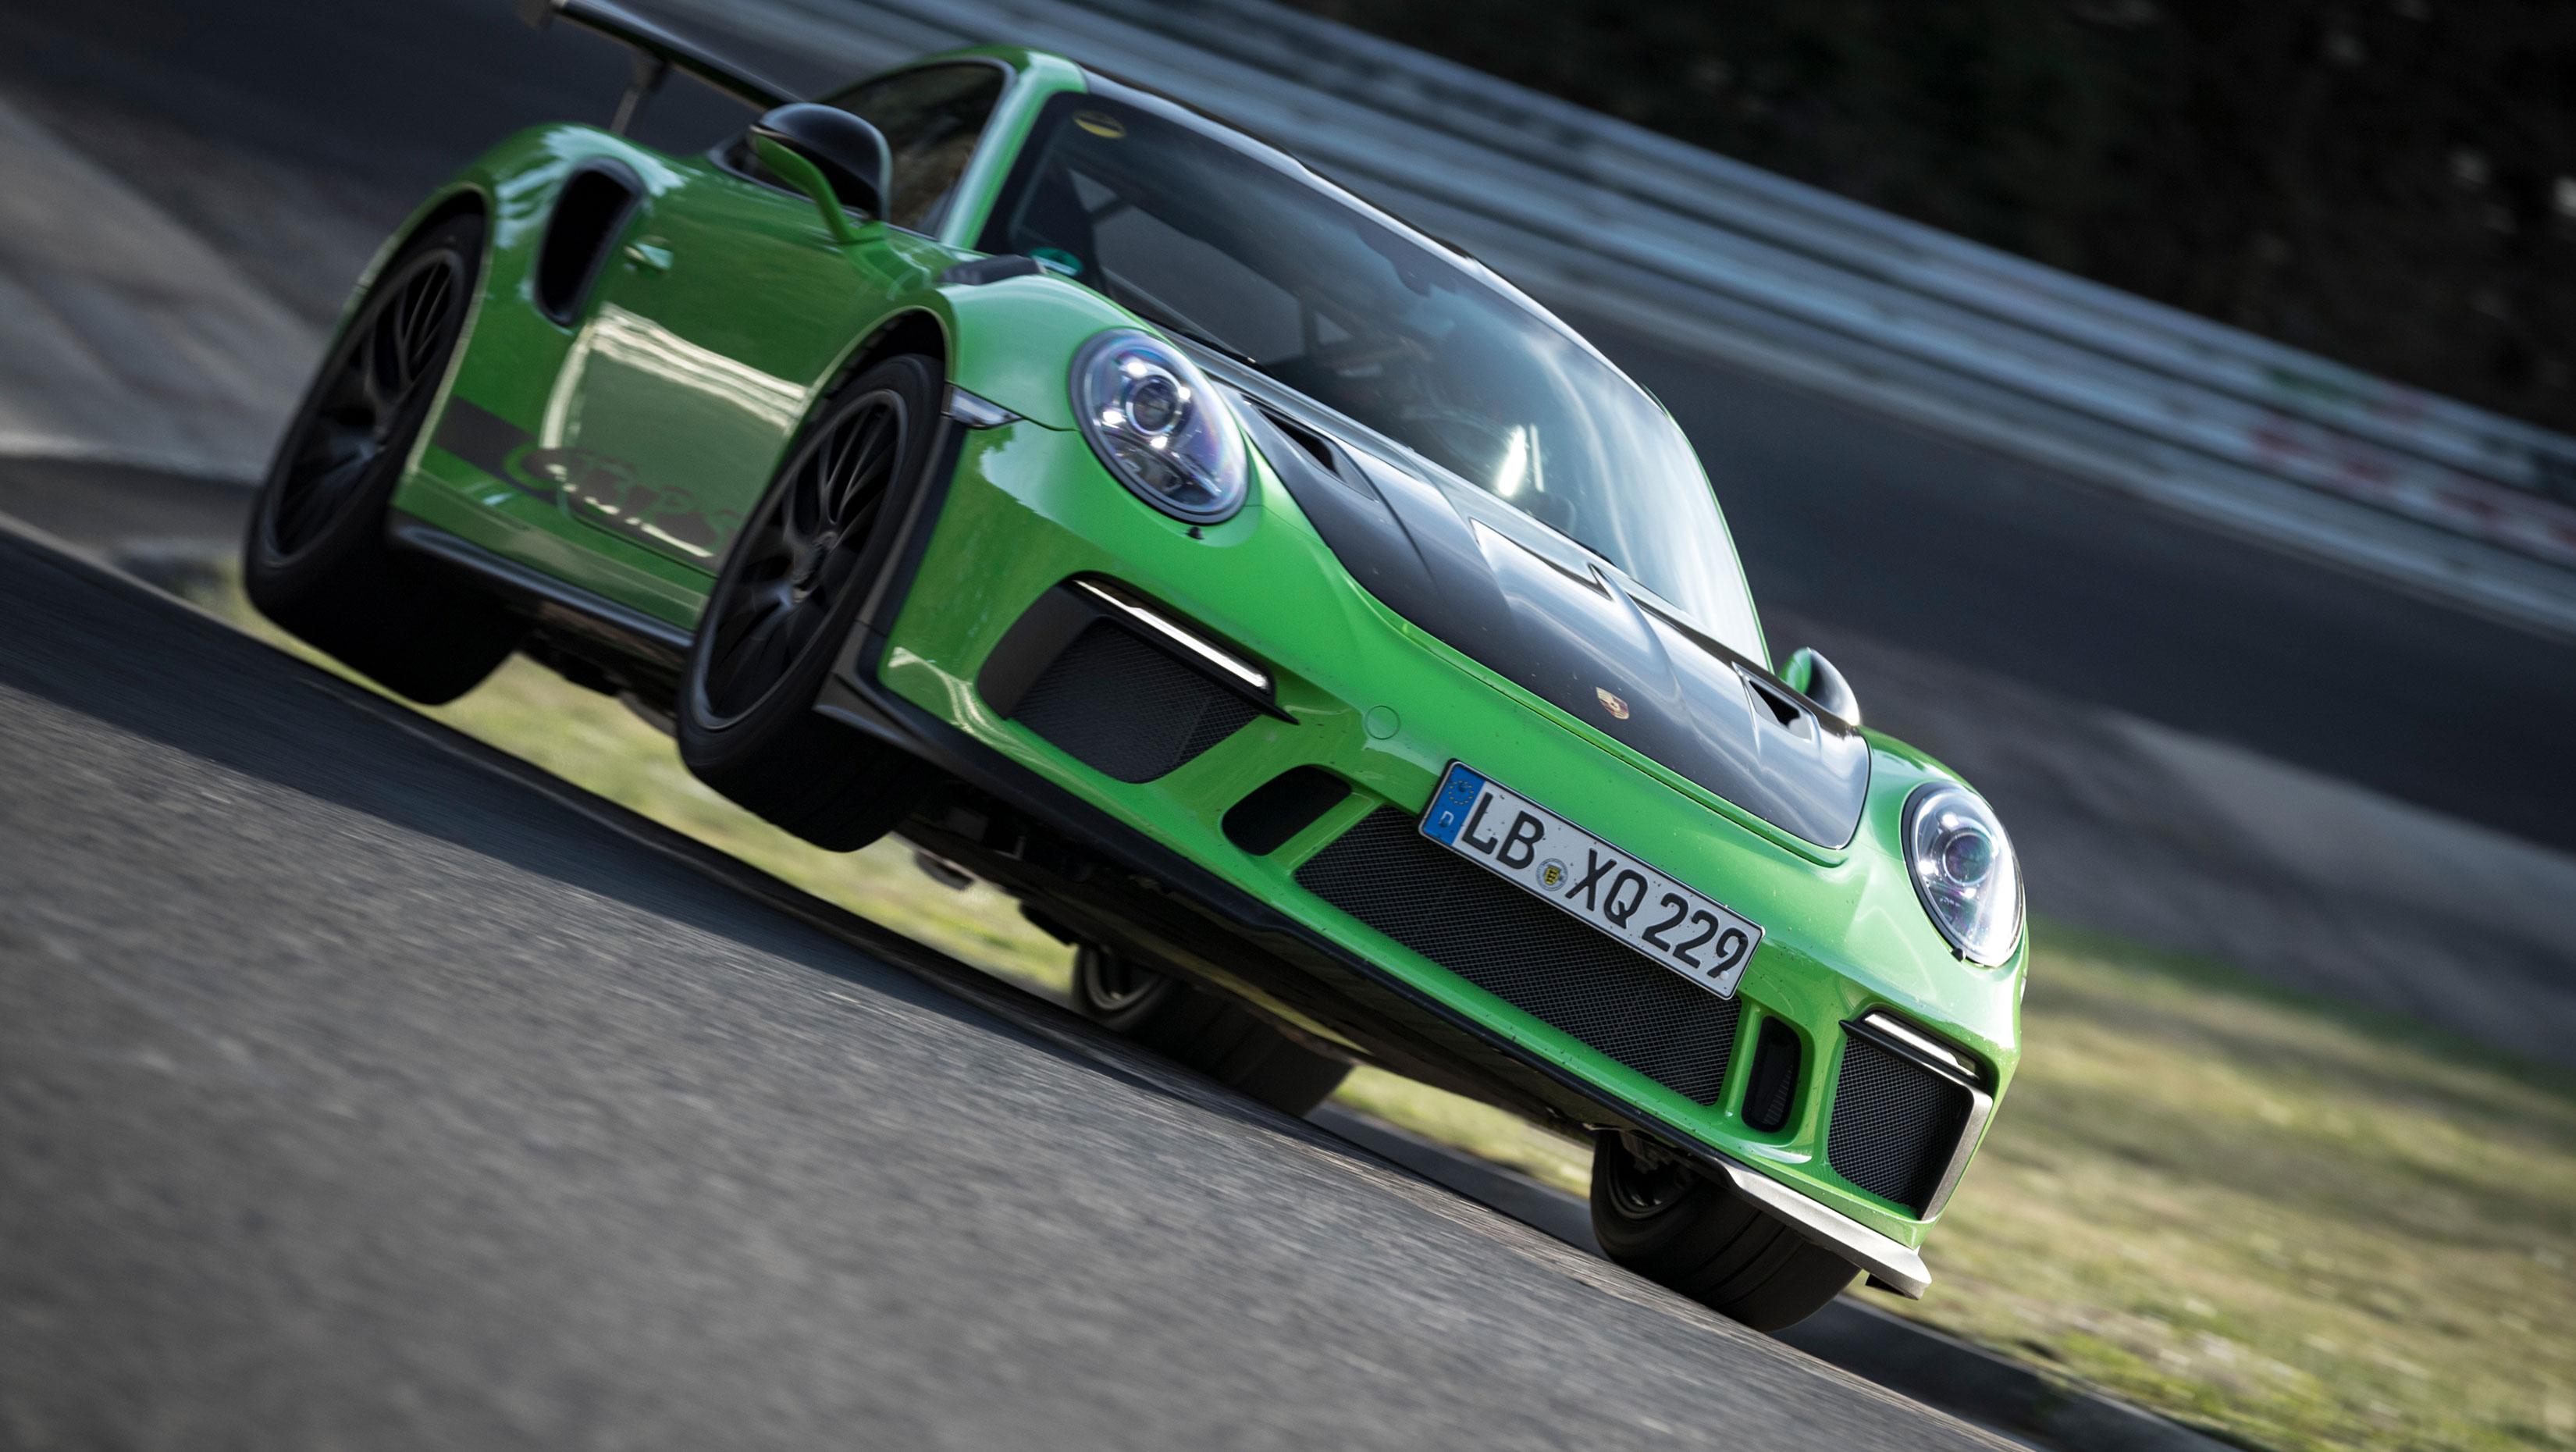 TrackWorthy - Porsche 911 GT3 RS Nurburgring Record - 03